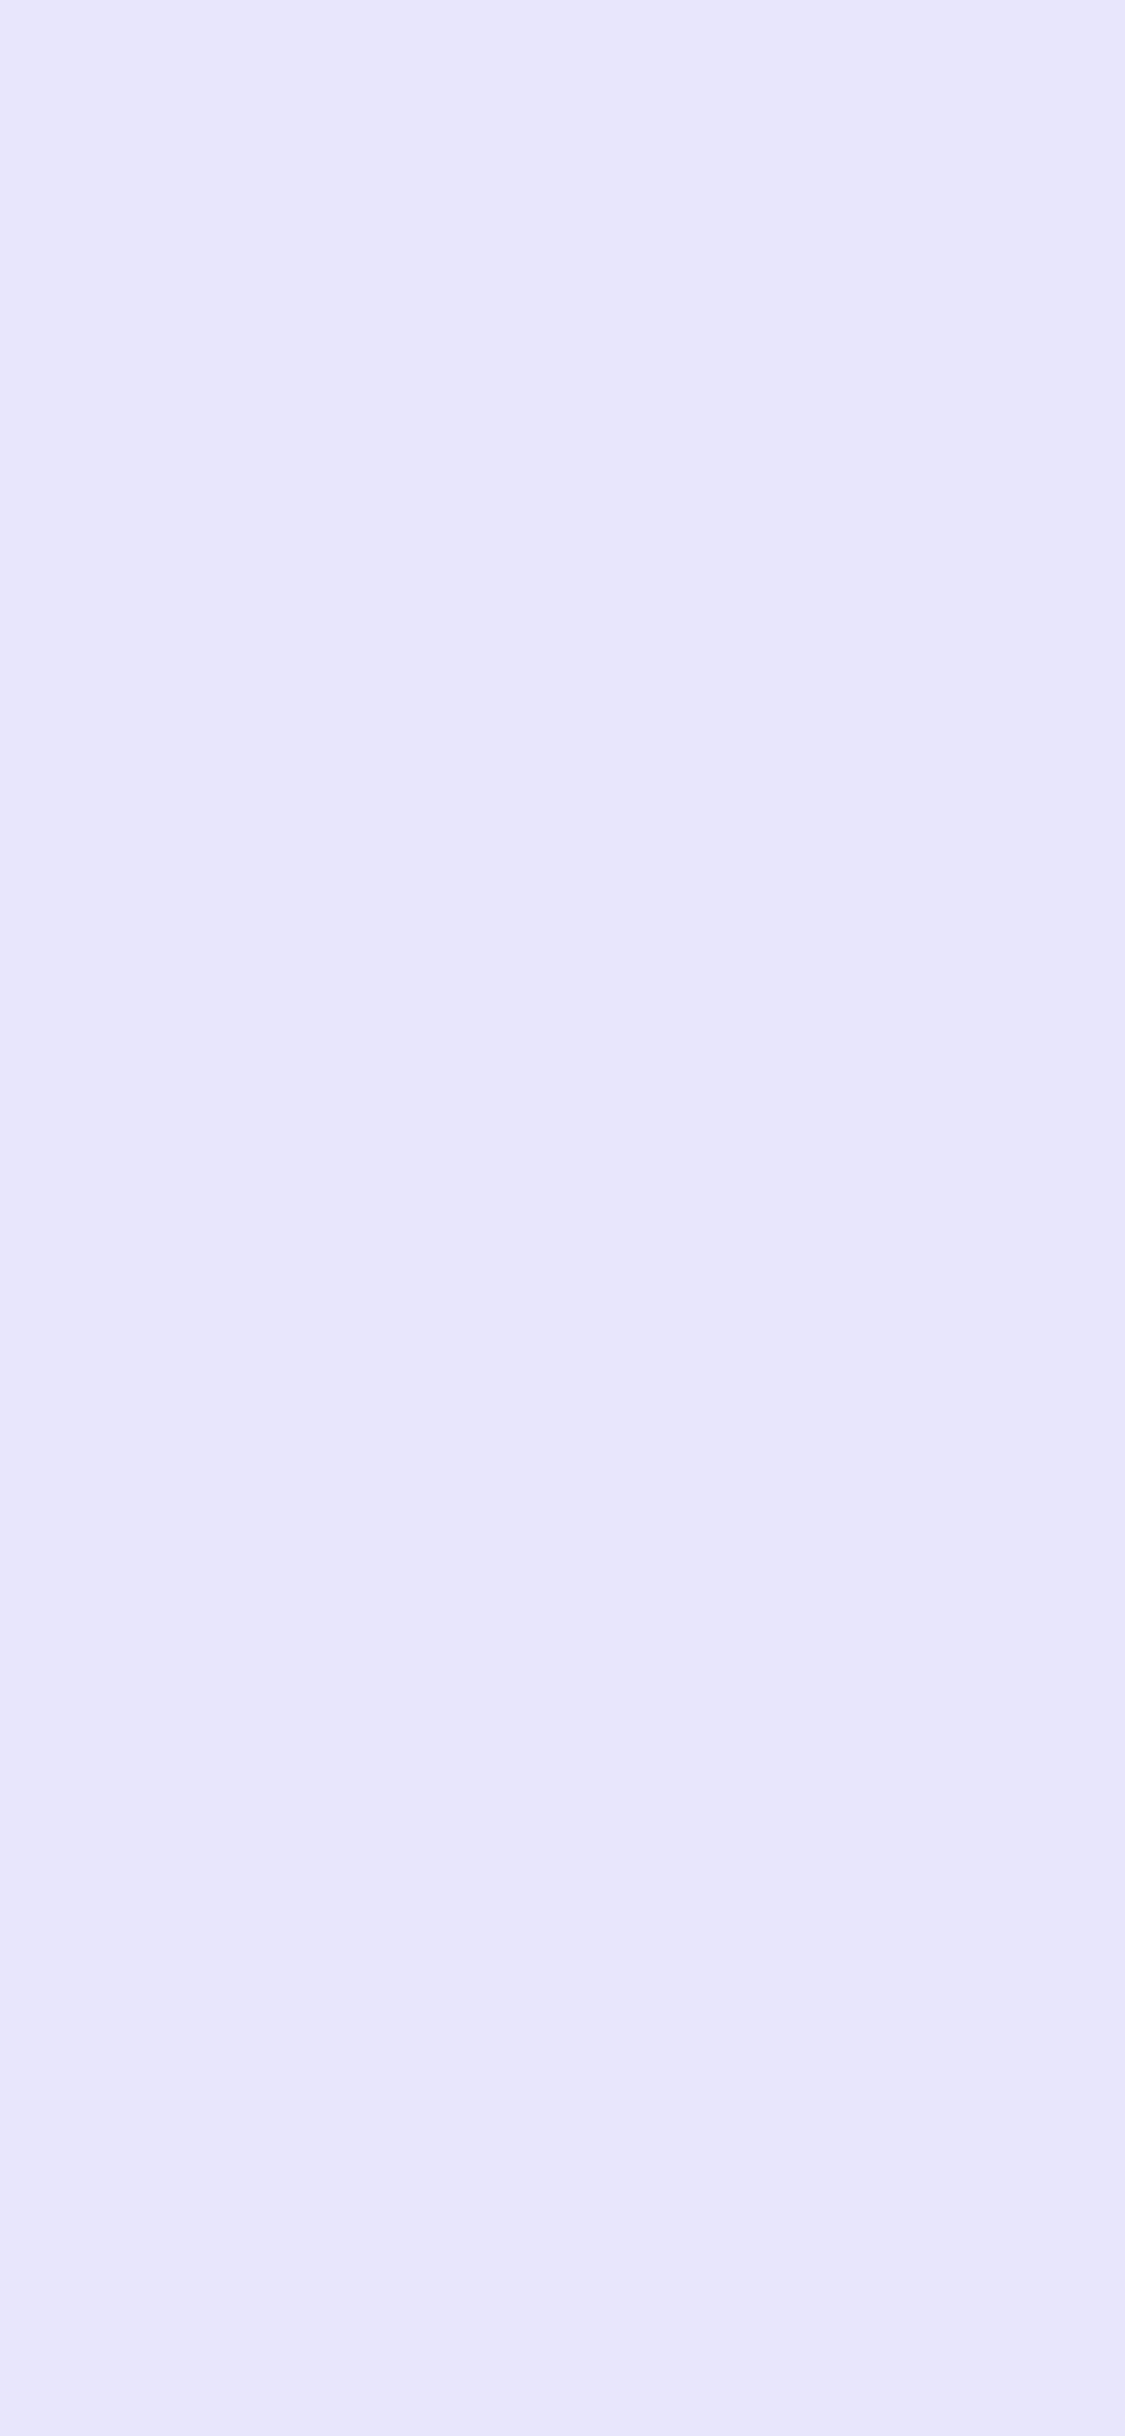 1125x2436 Lavender Web Solid Color Background